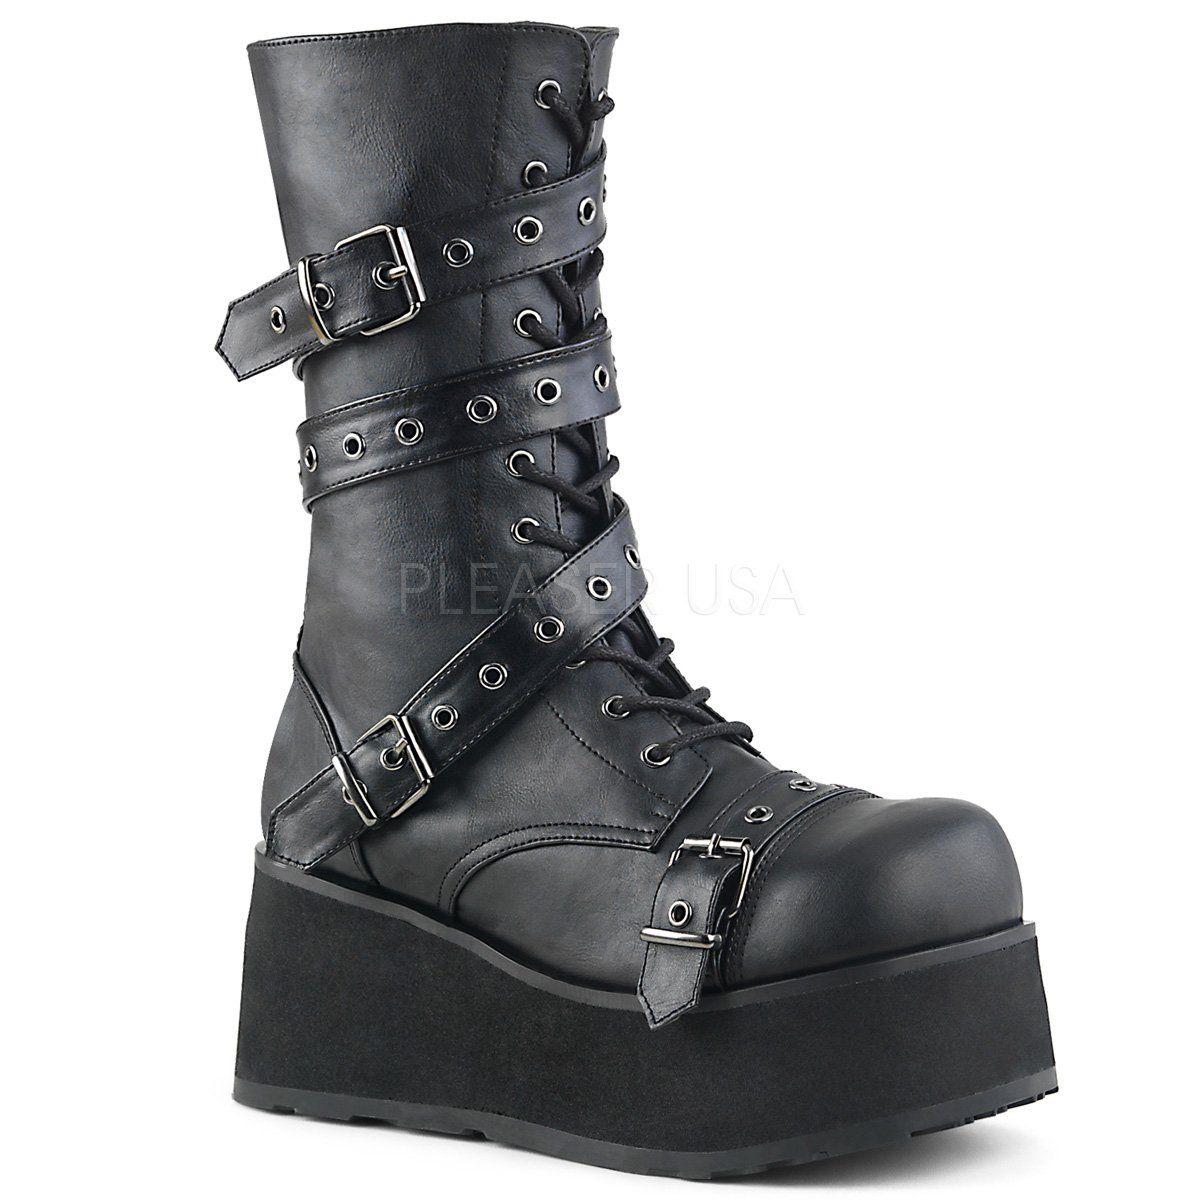 Chaussures Demonia Trashville noires Rock homme kdJKlR3l4